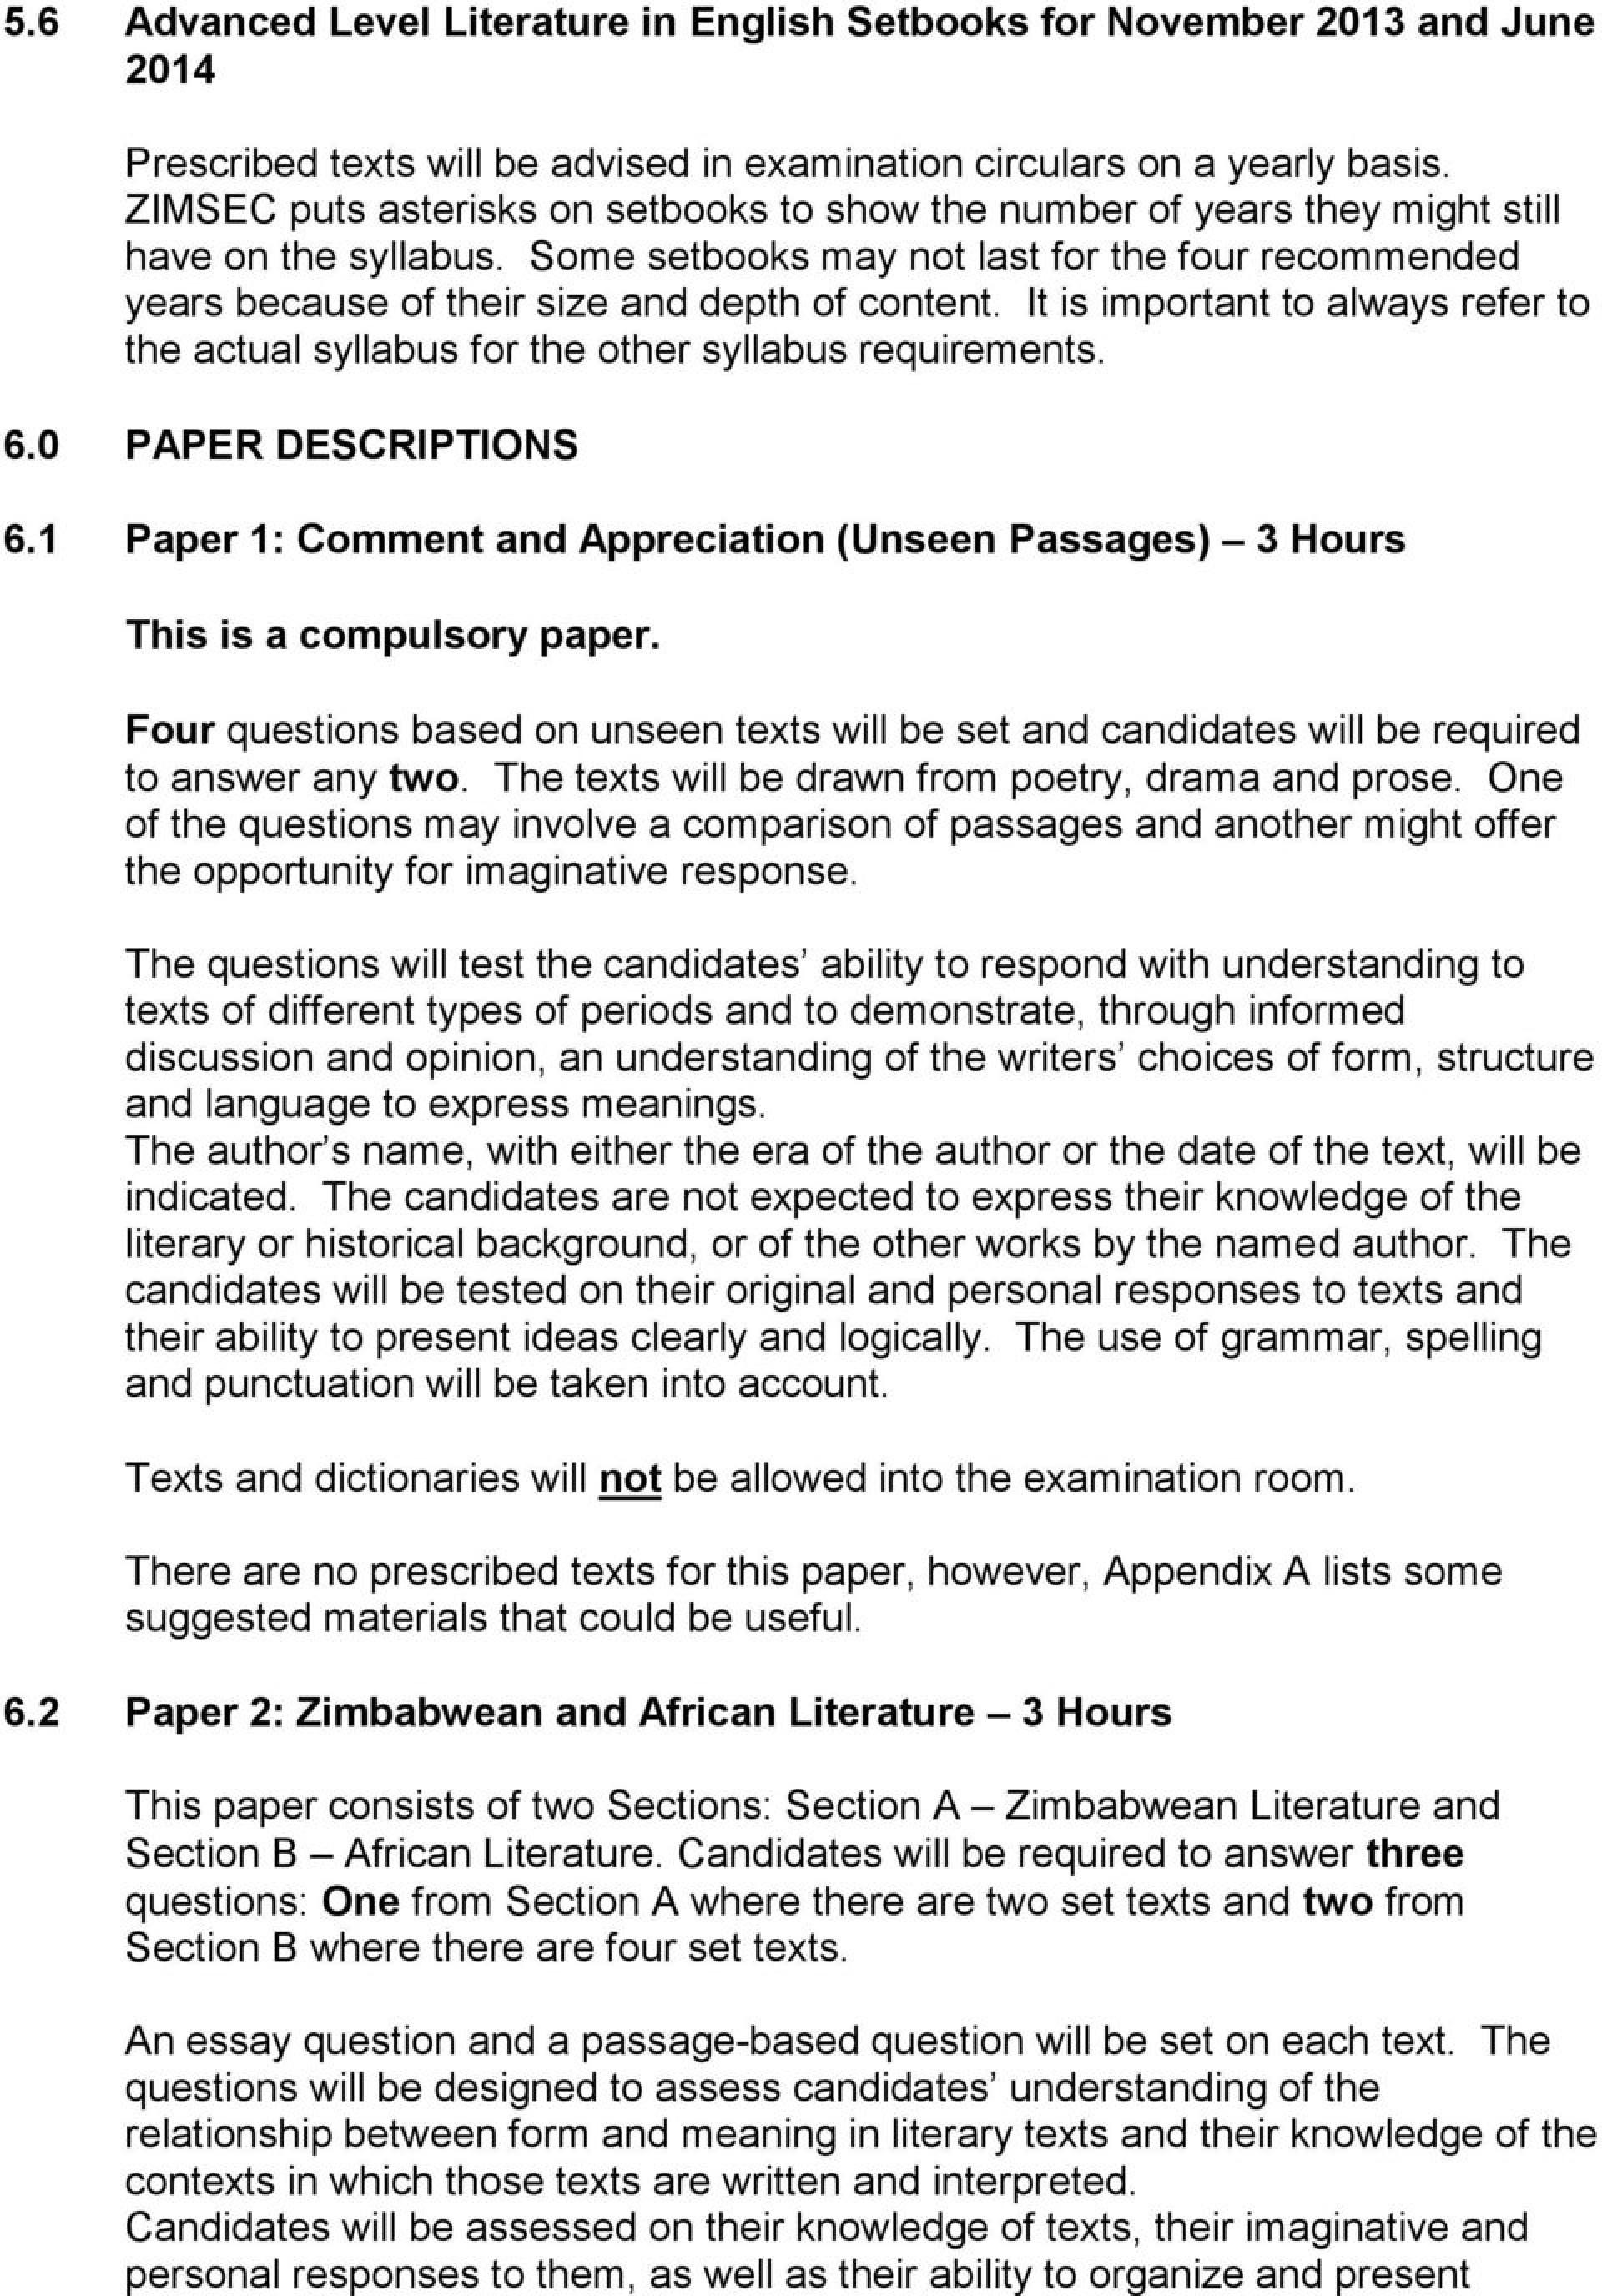 002 Concussion Essay Argumentative Research Paper Thesis Concussions Topics P Beautiful Outline Examples Conclusion 1920